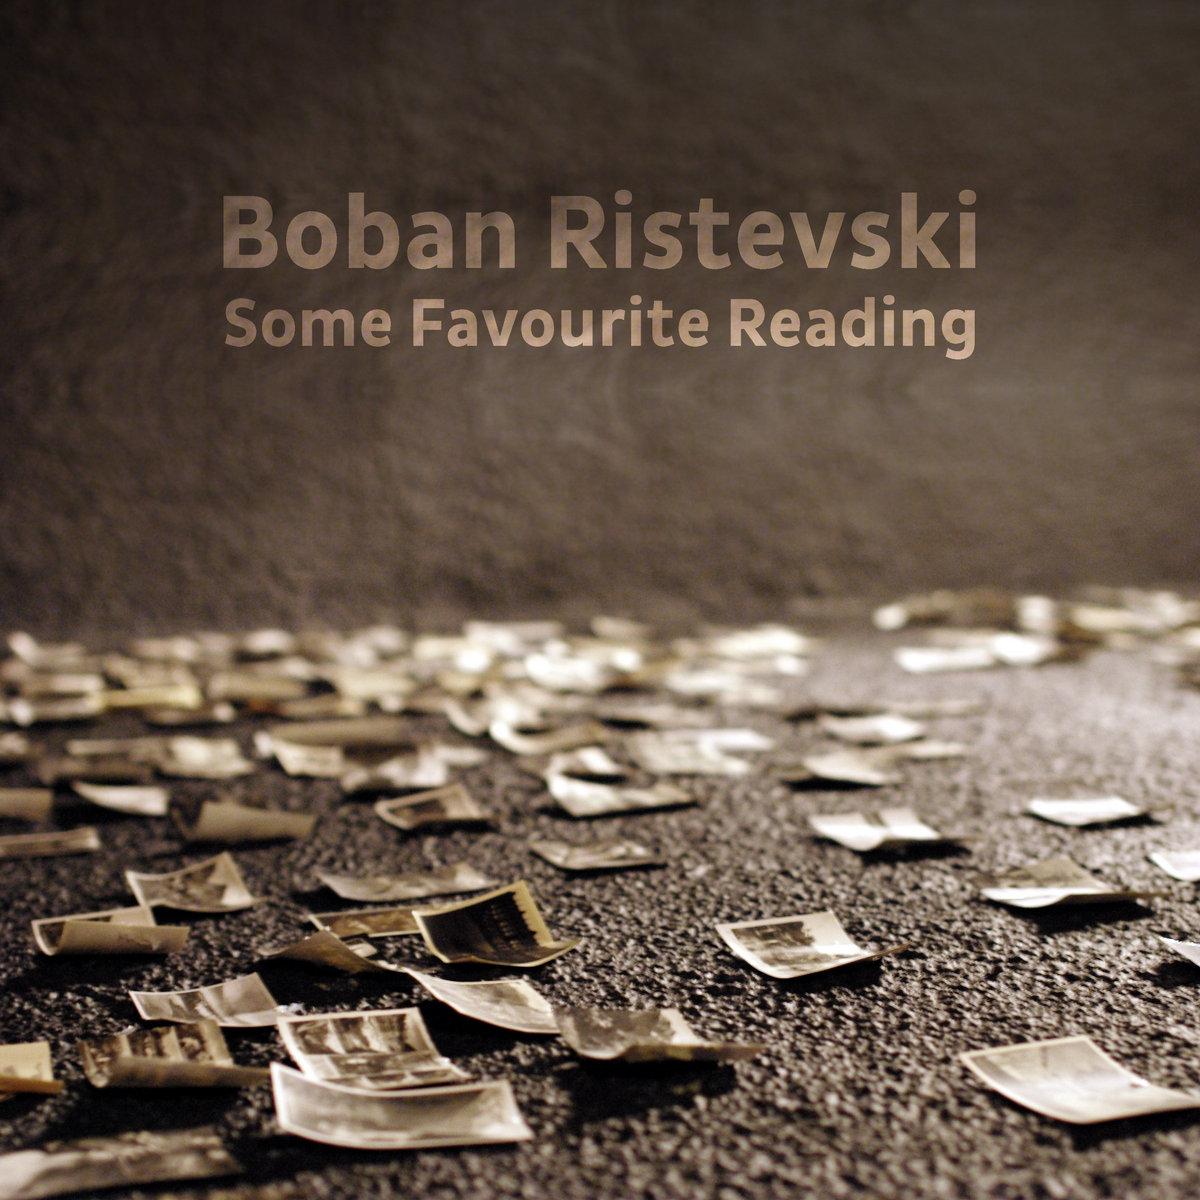 Boban Ristevski – Some Favourite Reading